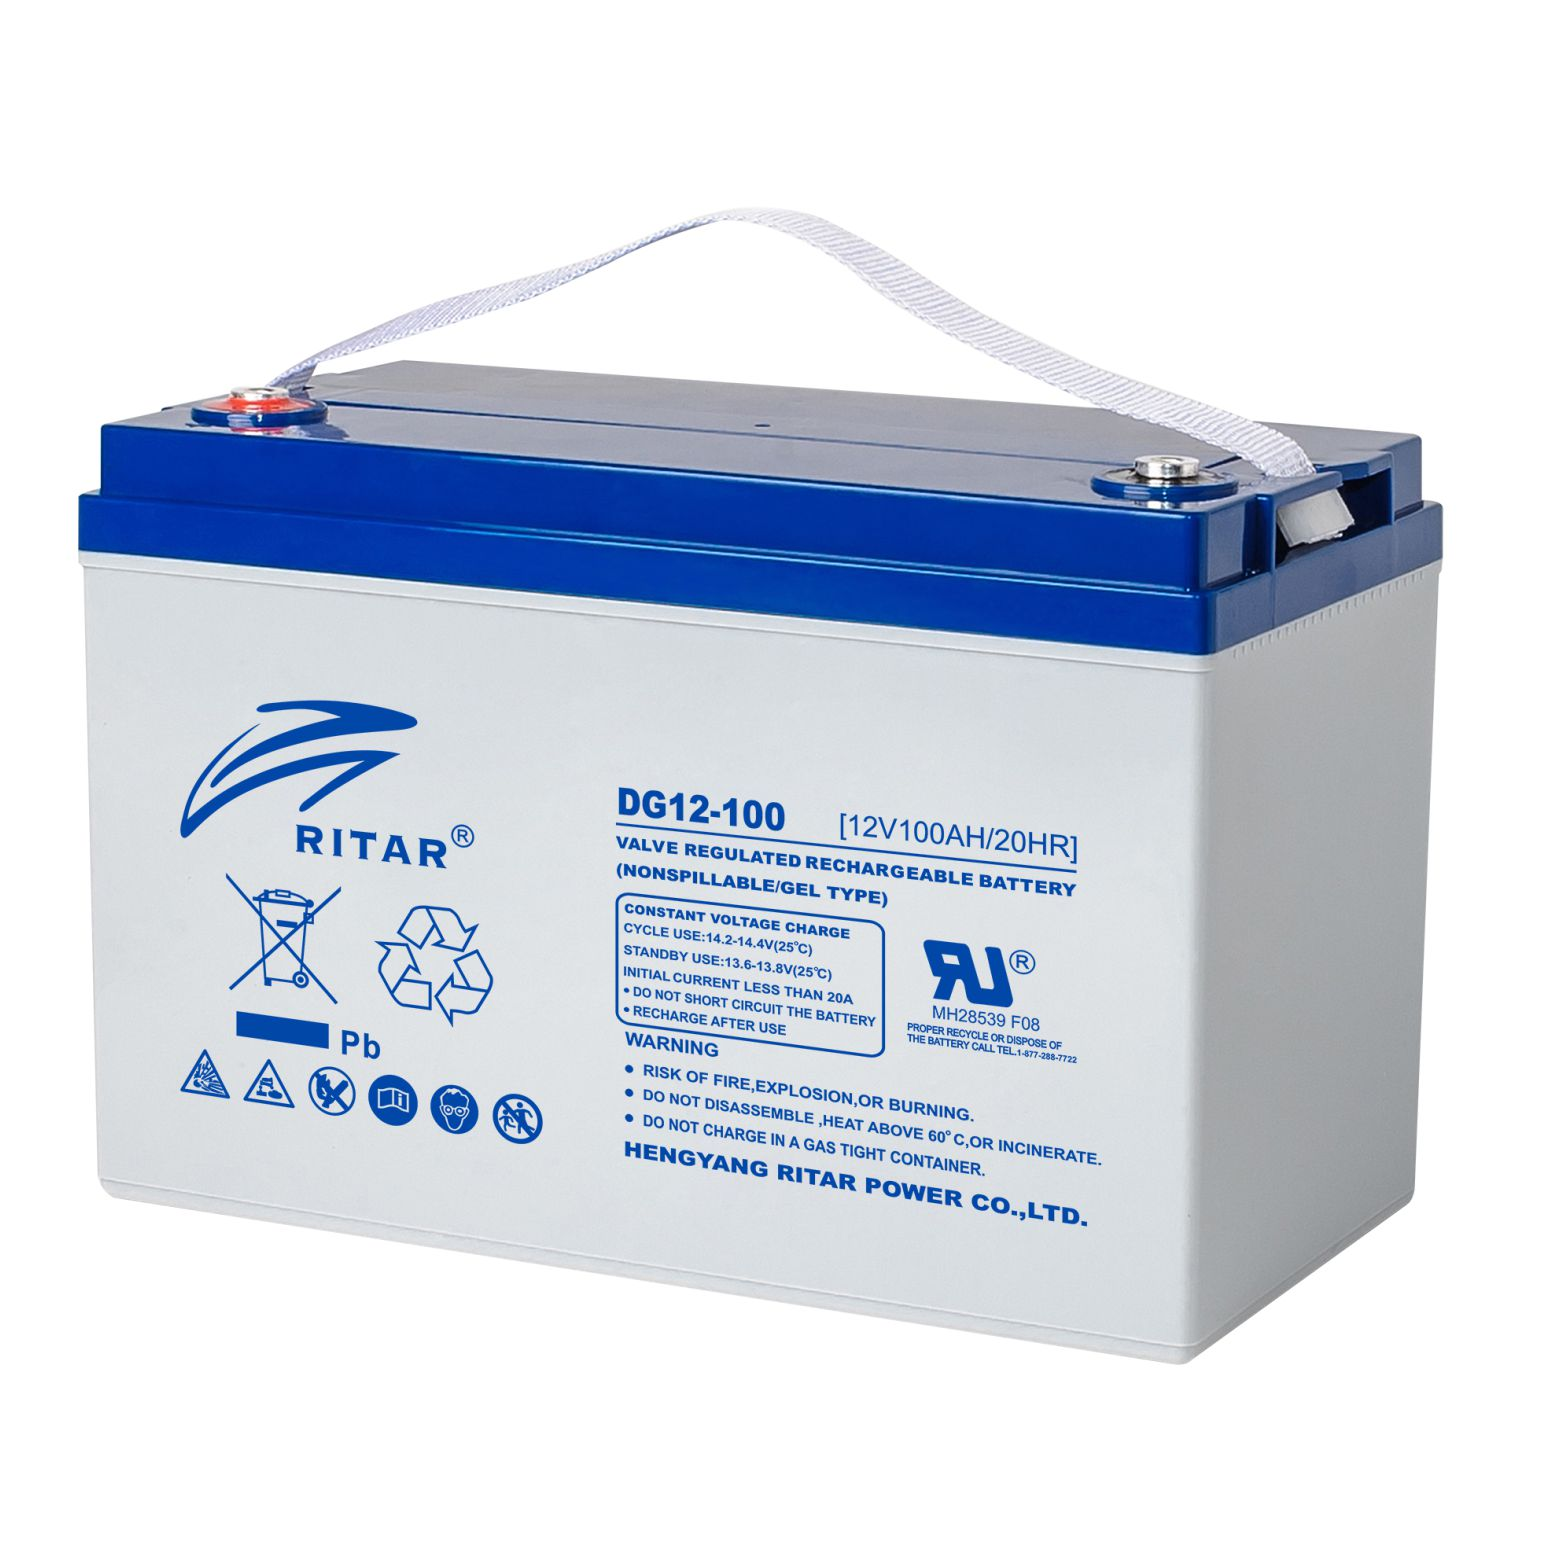 Ritar DG12-200(12V200Ah) Battery